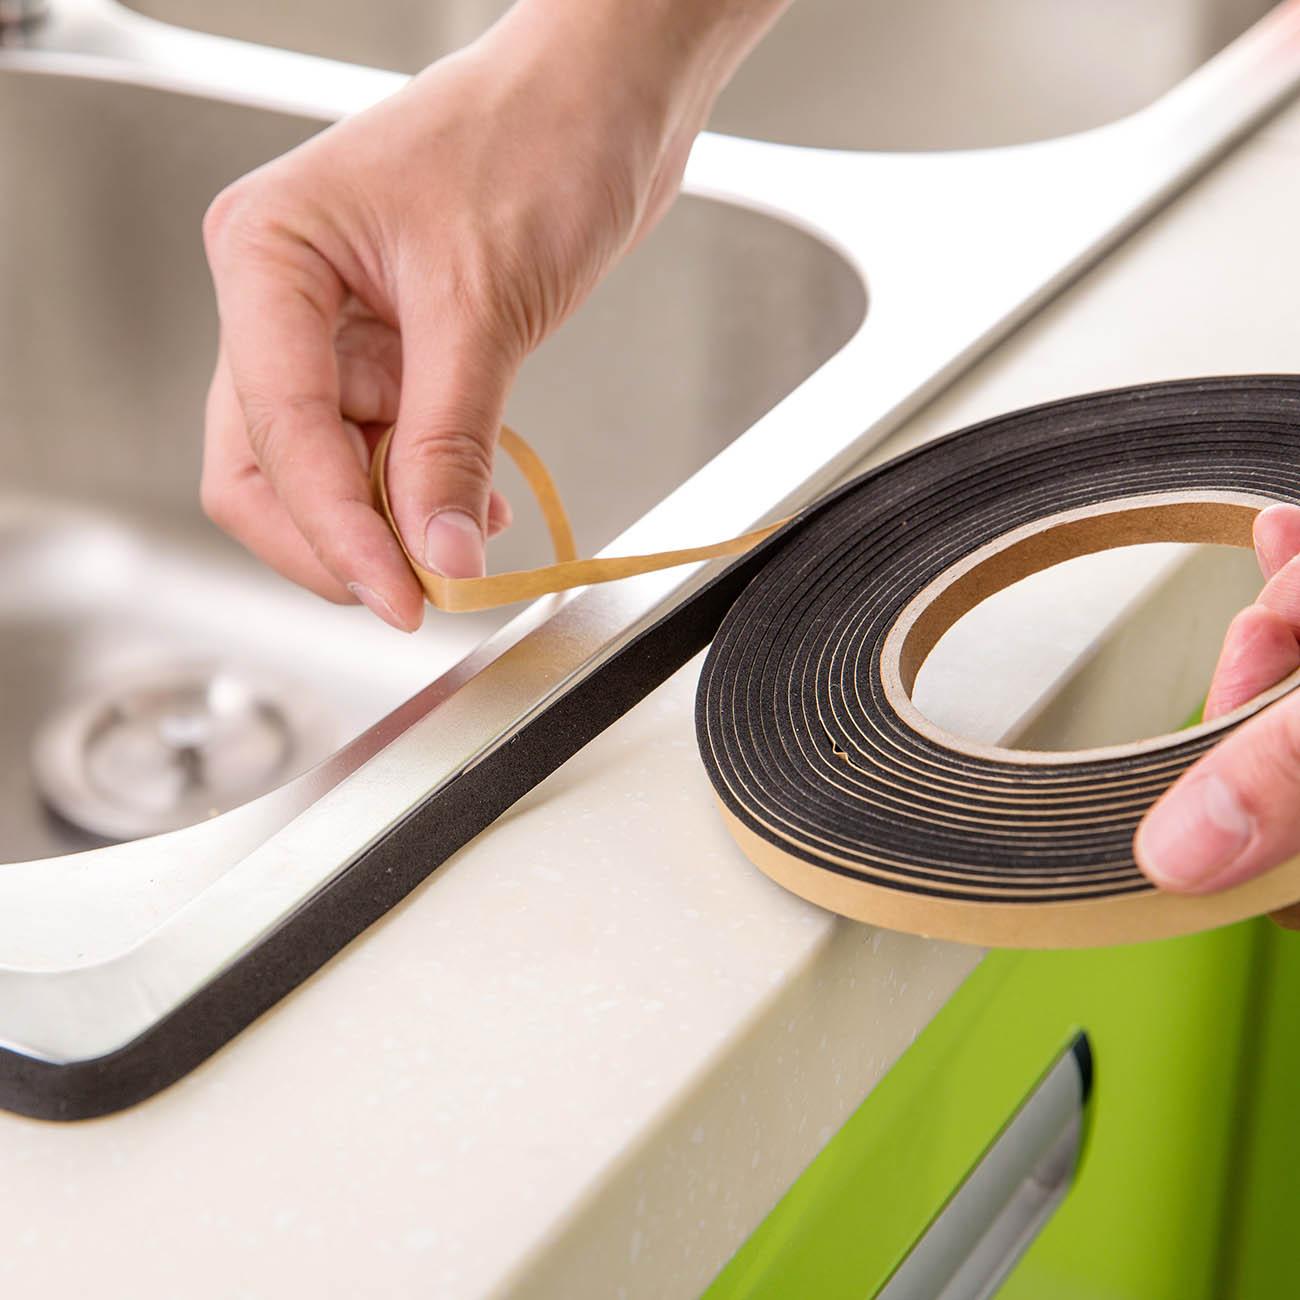 OTHERHOUSE 1Roll Kitchen Waterproof Oilproof Sink Sticker Wash Basin Sealing Tape Adhesive Sealing Strip Window Door Seal